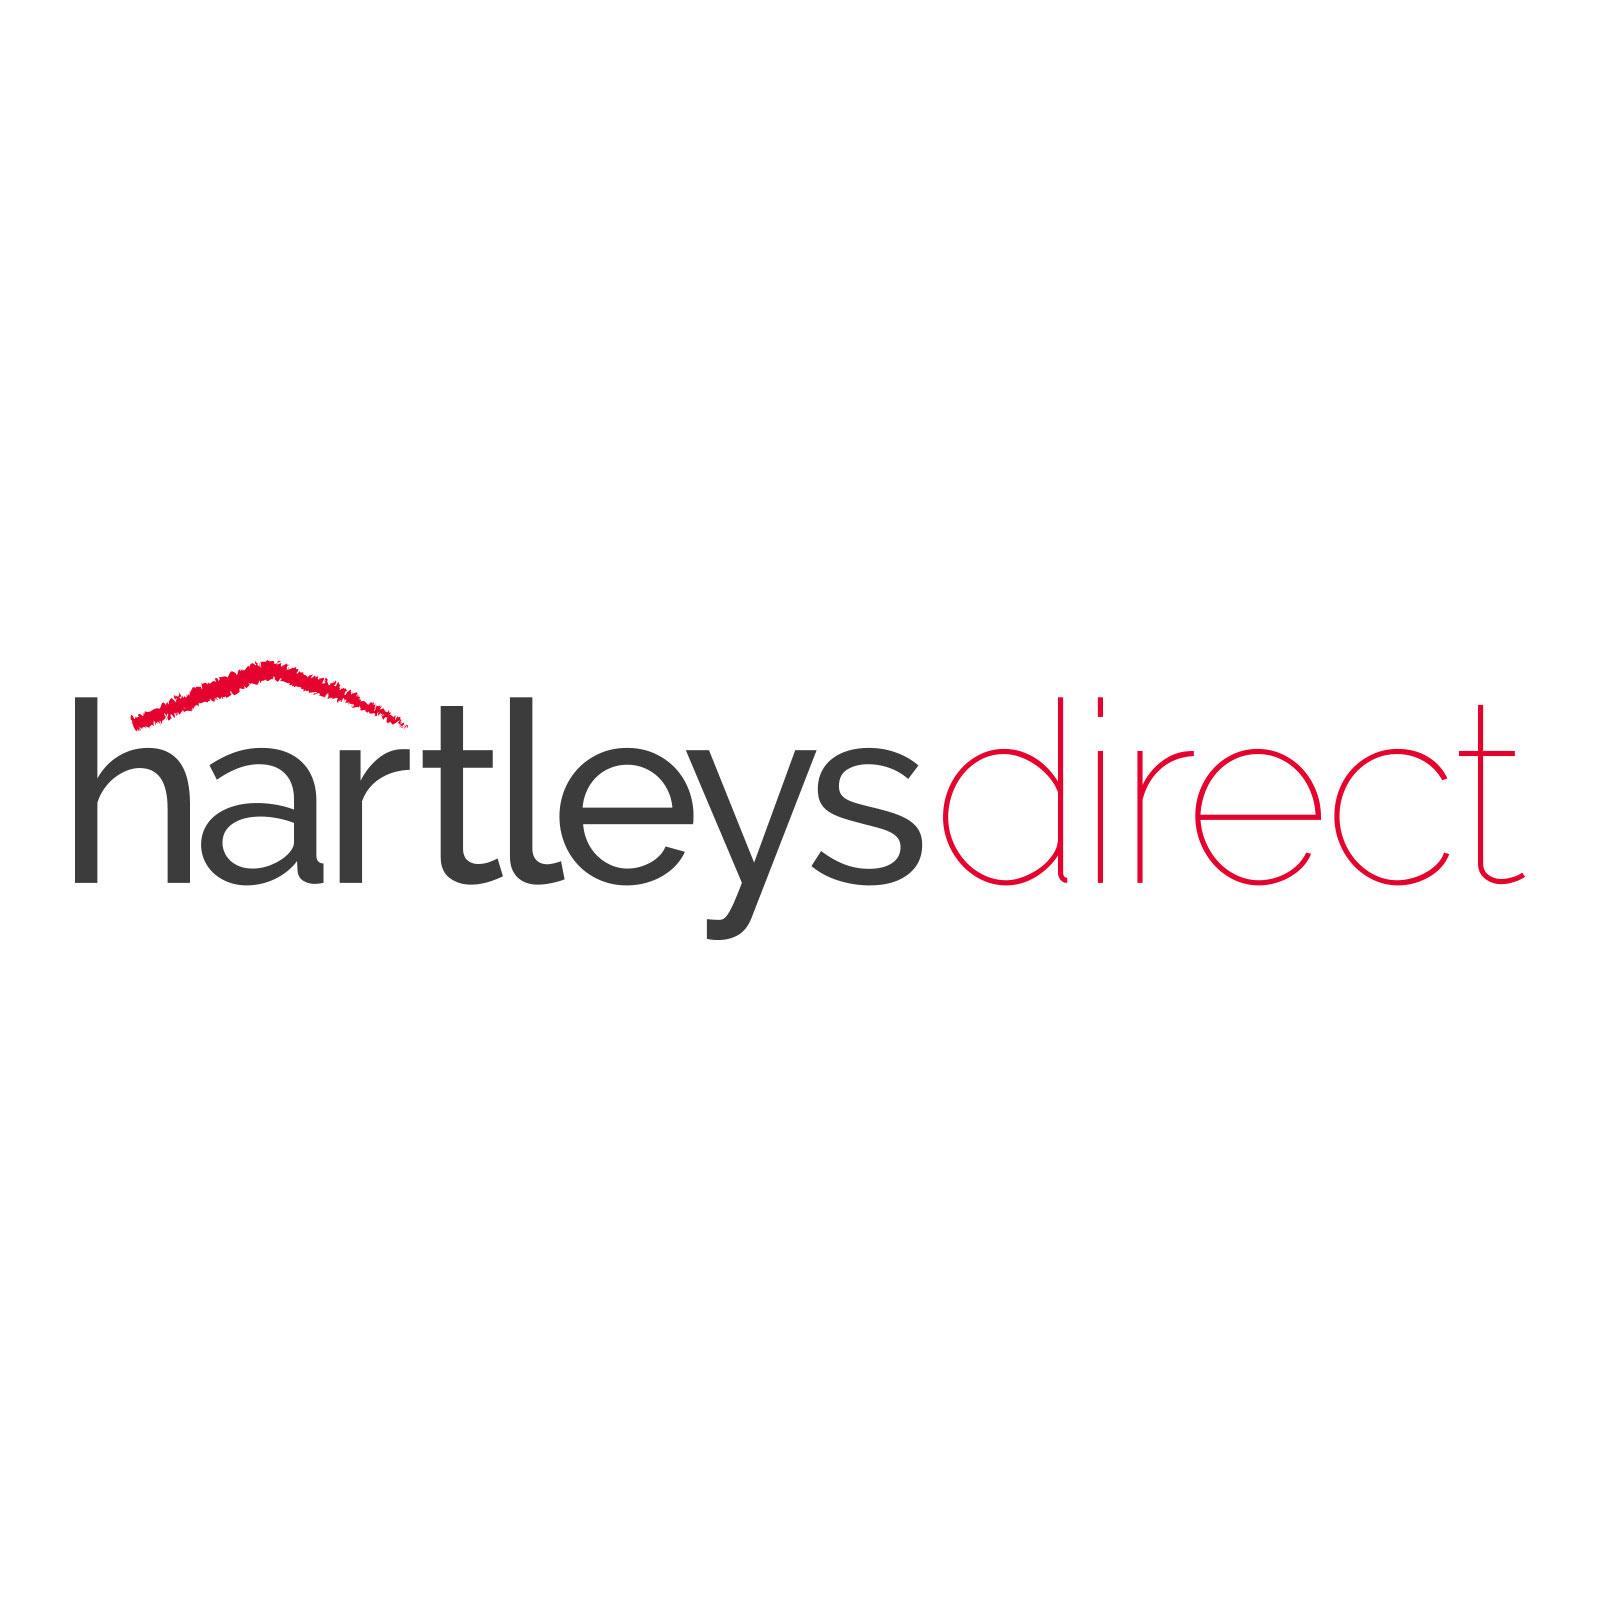 Hartleys-Grey-Fabric-Storage-Drawer-for-6-8-9-Cube-Unit-on-White-Background.jpg